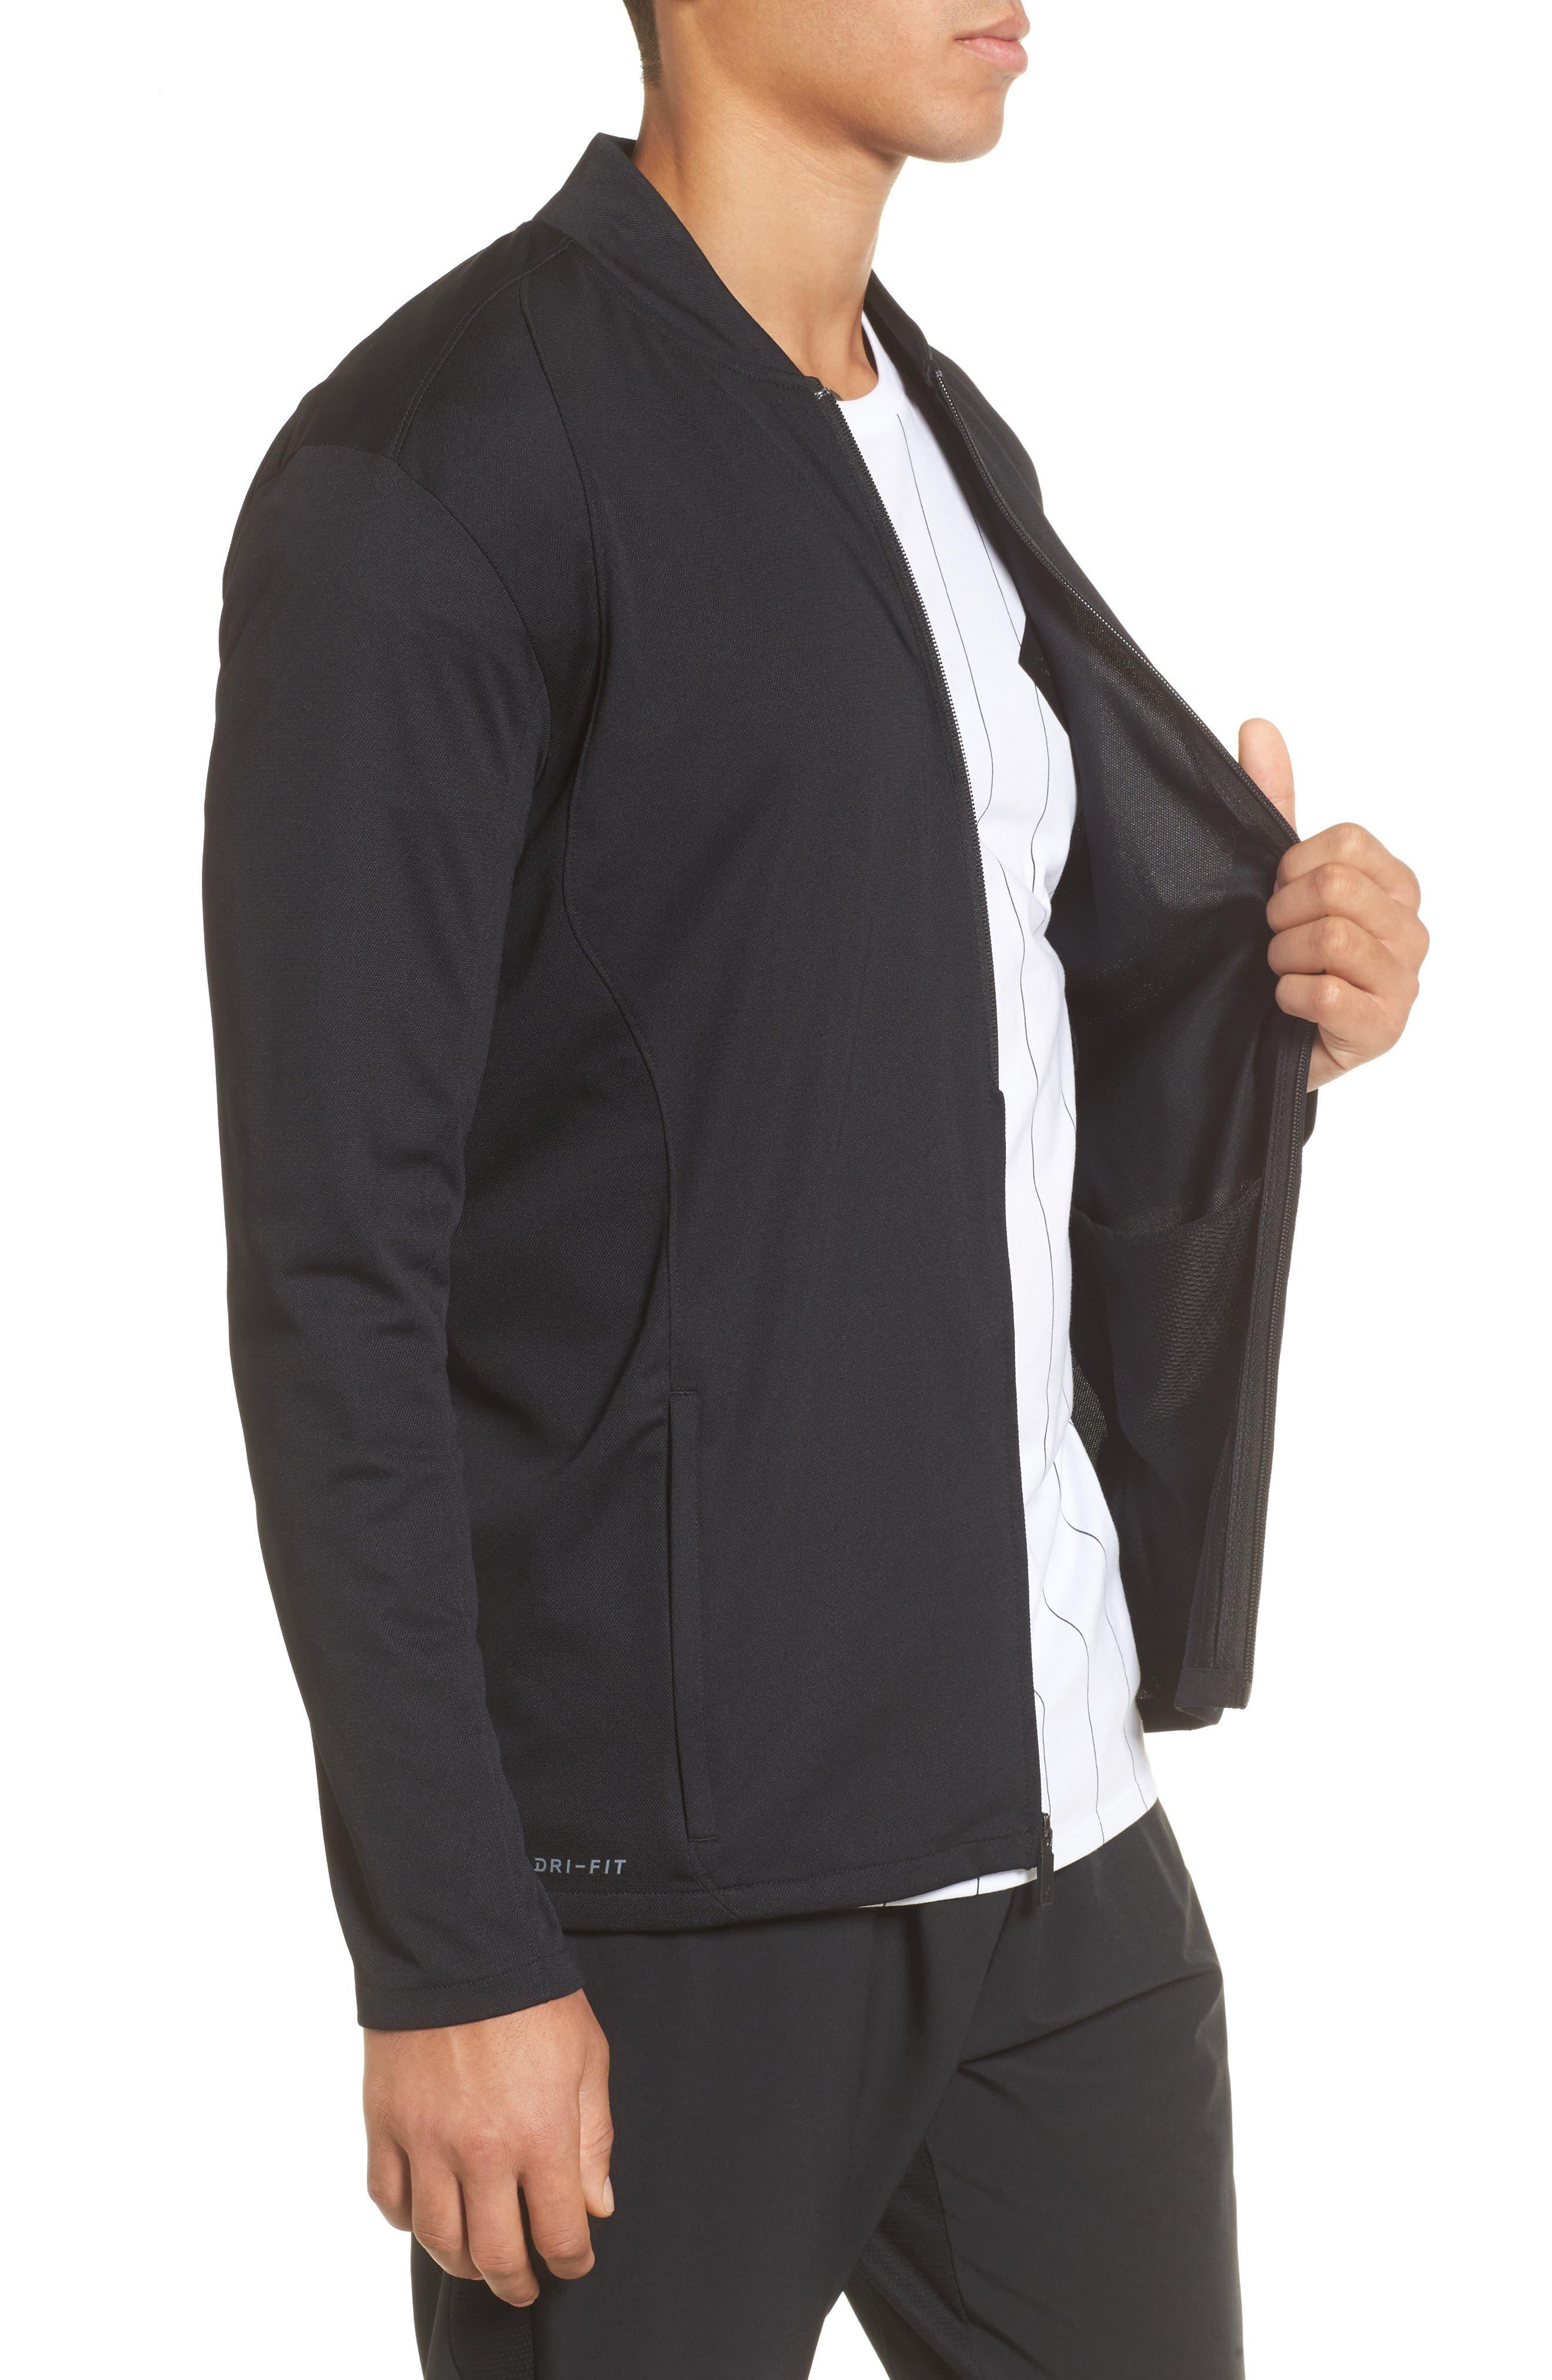 Ultimate Flight Zip Jacket,                             Alternate thumbnail 3, color,                             Black/ Black